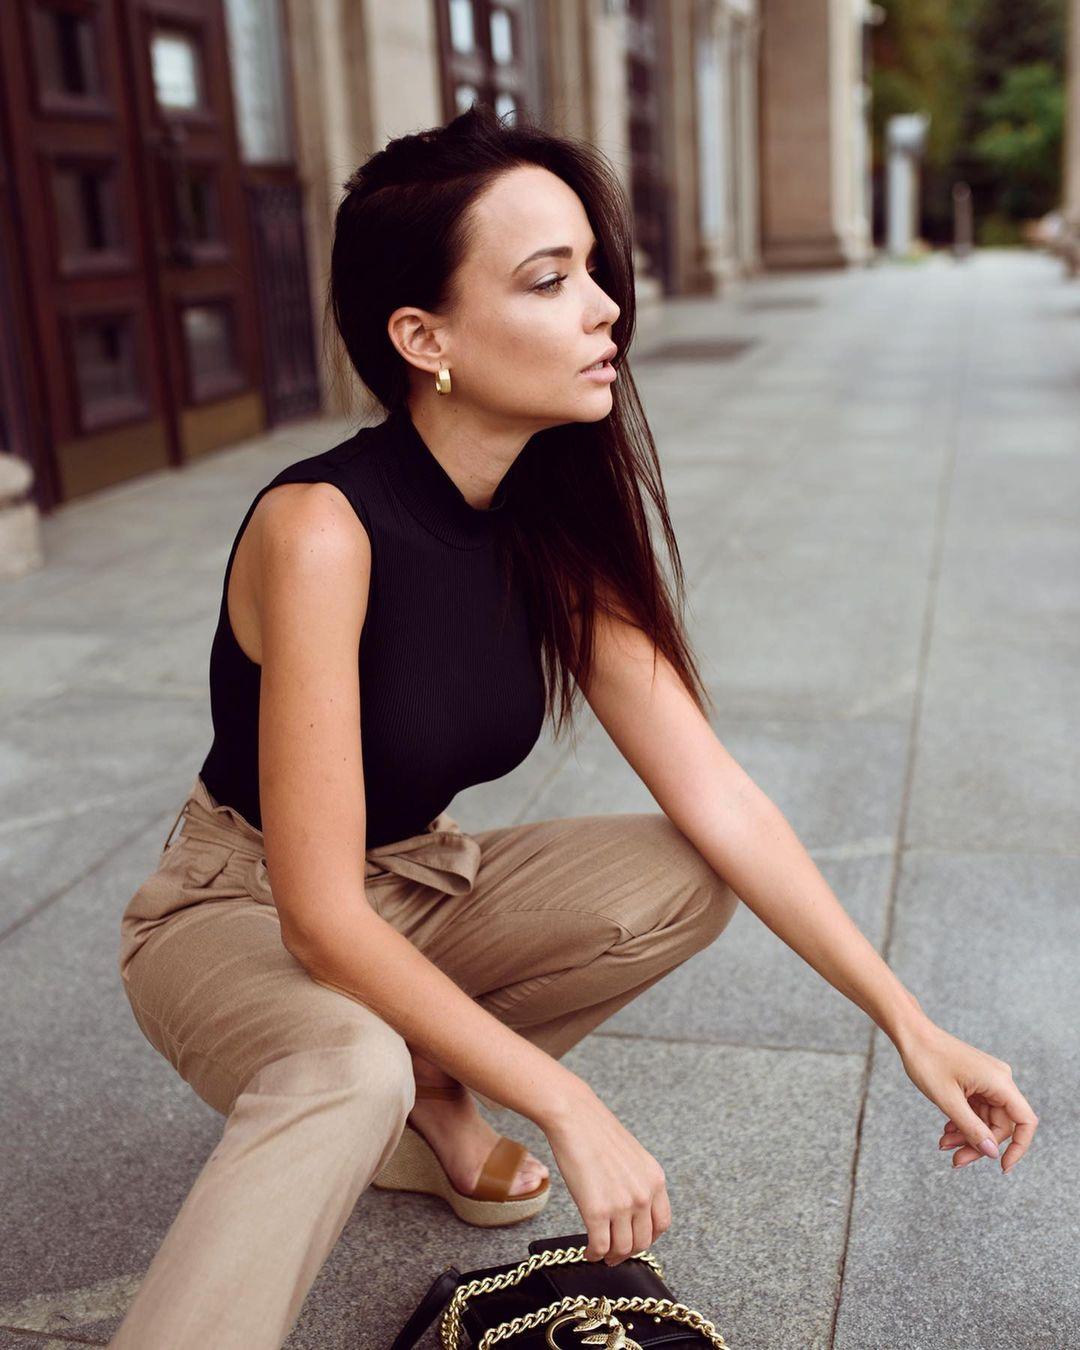 Angelina-Petrova-Wallpapers-Insta-Fit-Bio-3